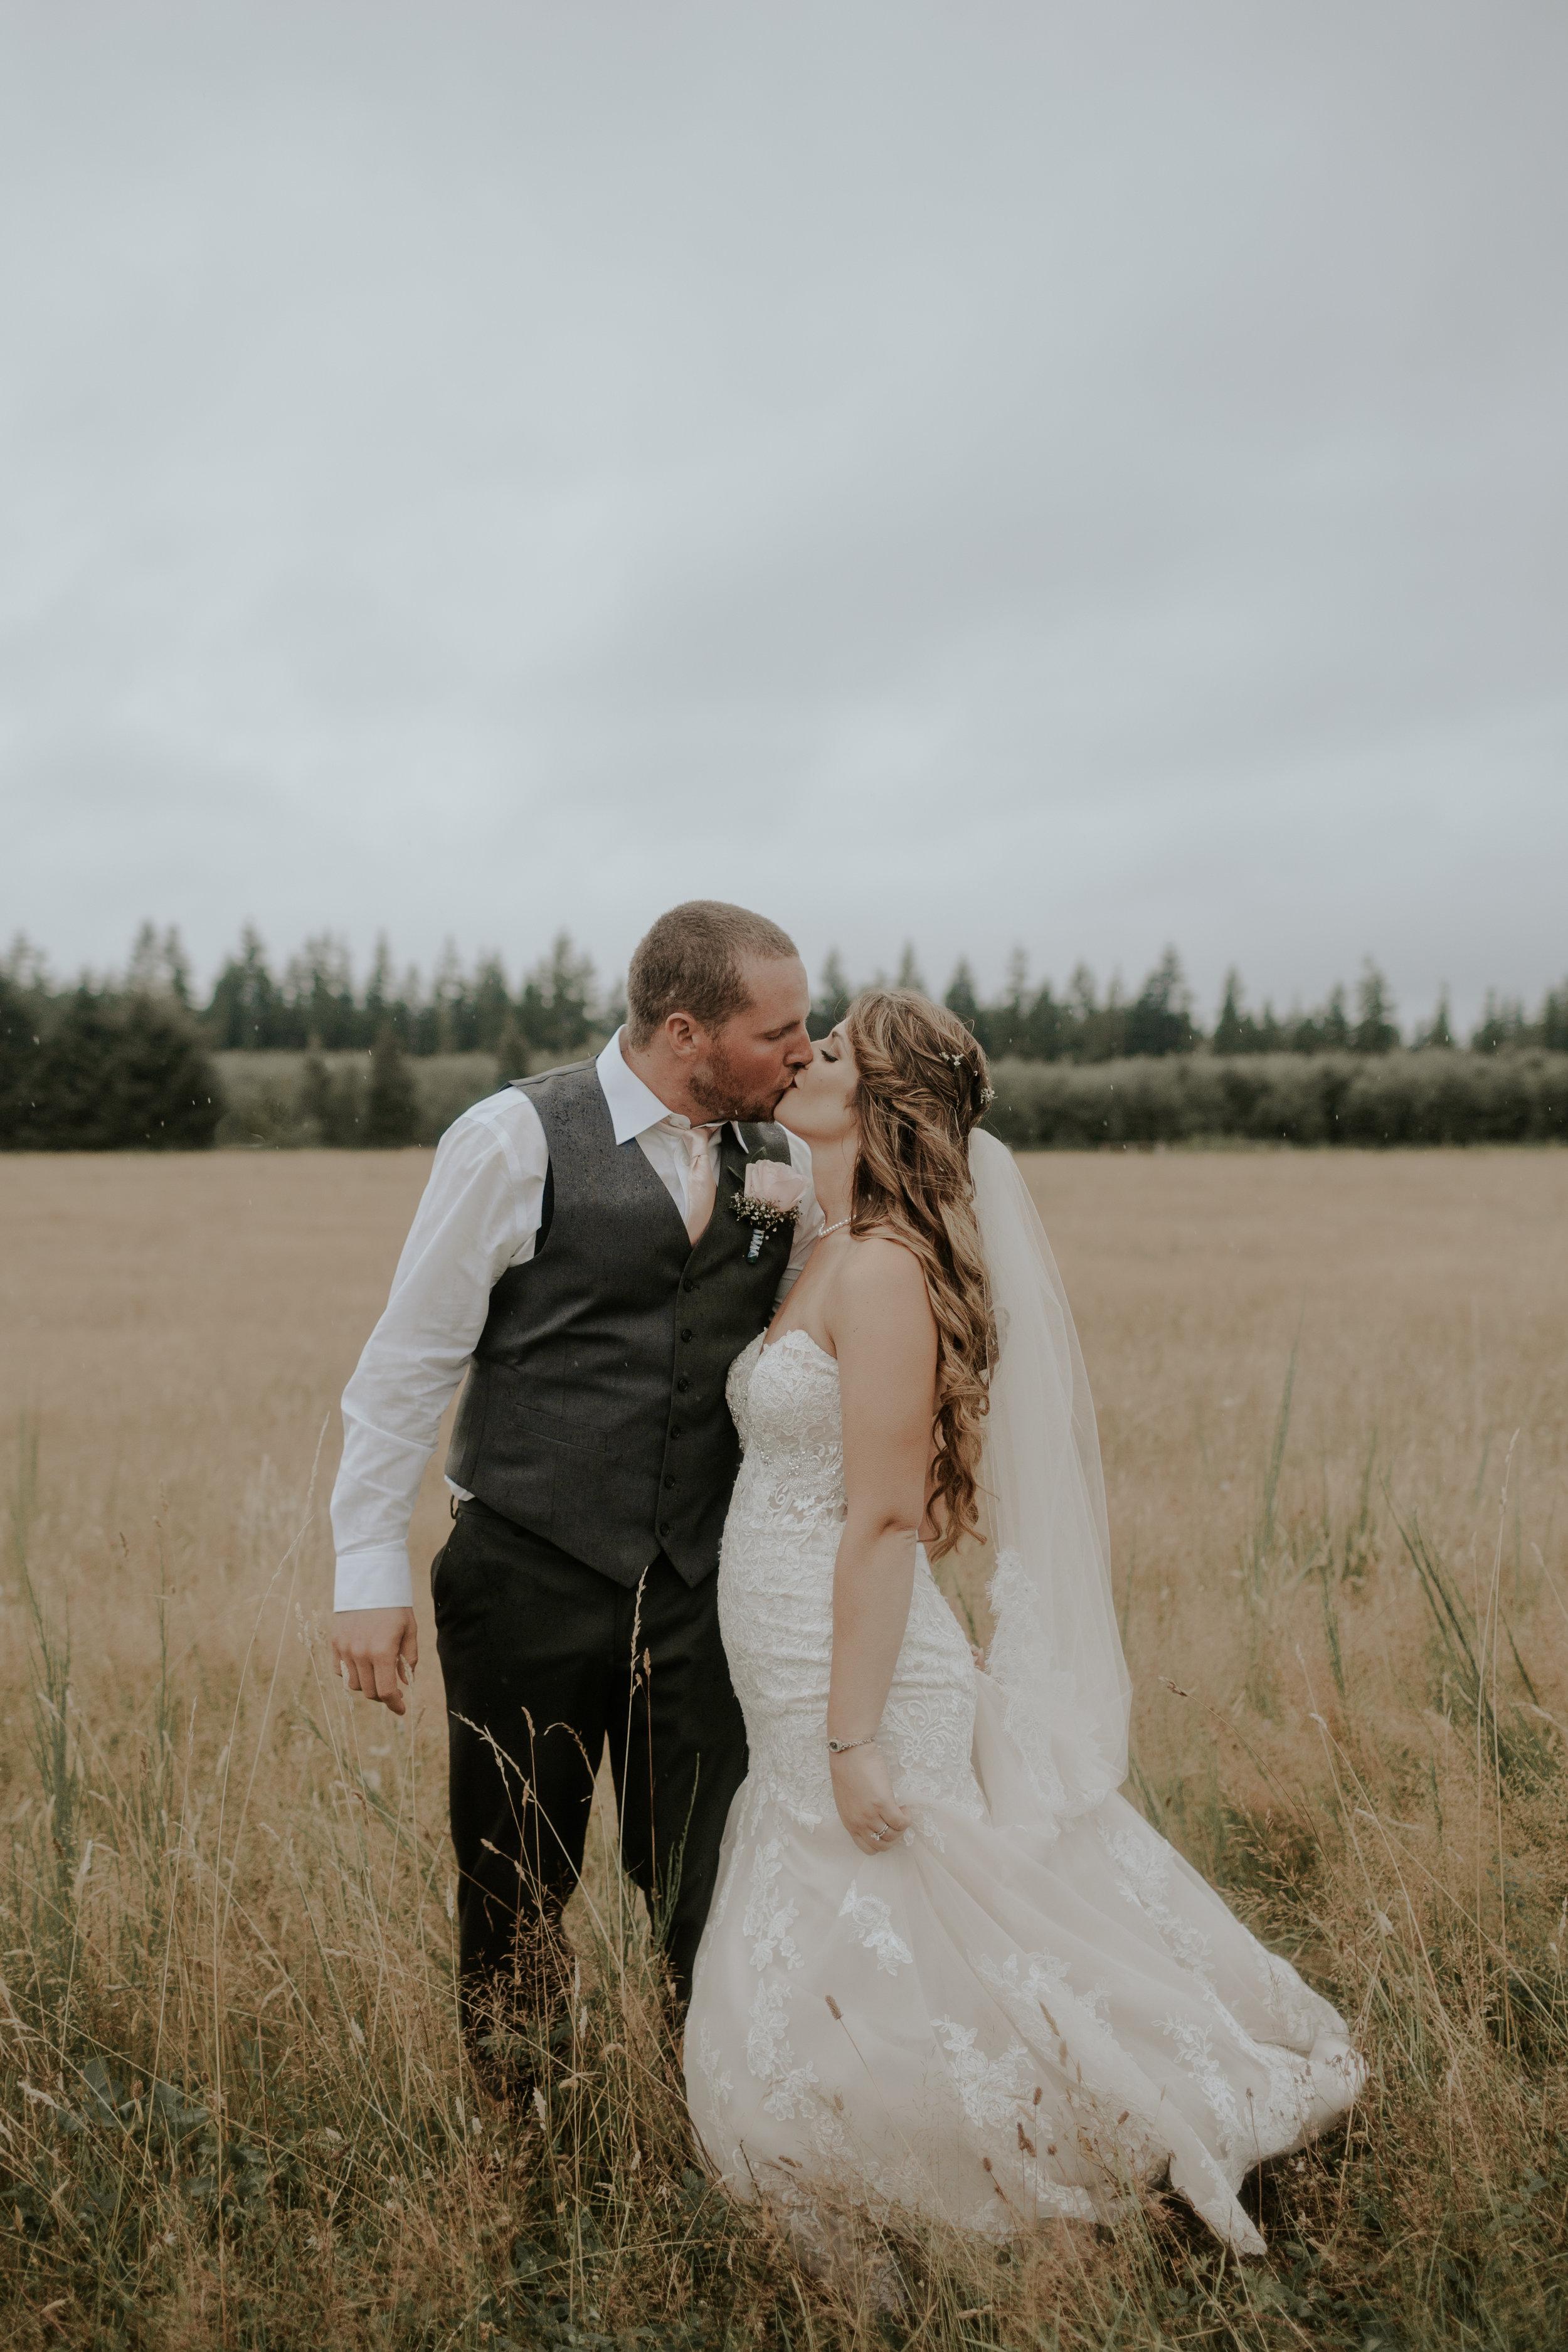 Olympic-Peninsula-Wedding-Photographer-PNW-Forks-Port-Angeles-Kayla-Dawn-Photography-engagement-Olympic-National-Park-152.jpg